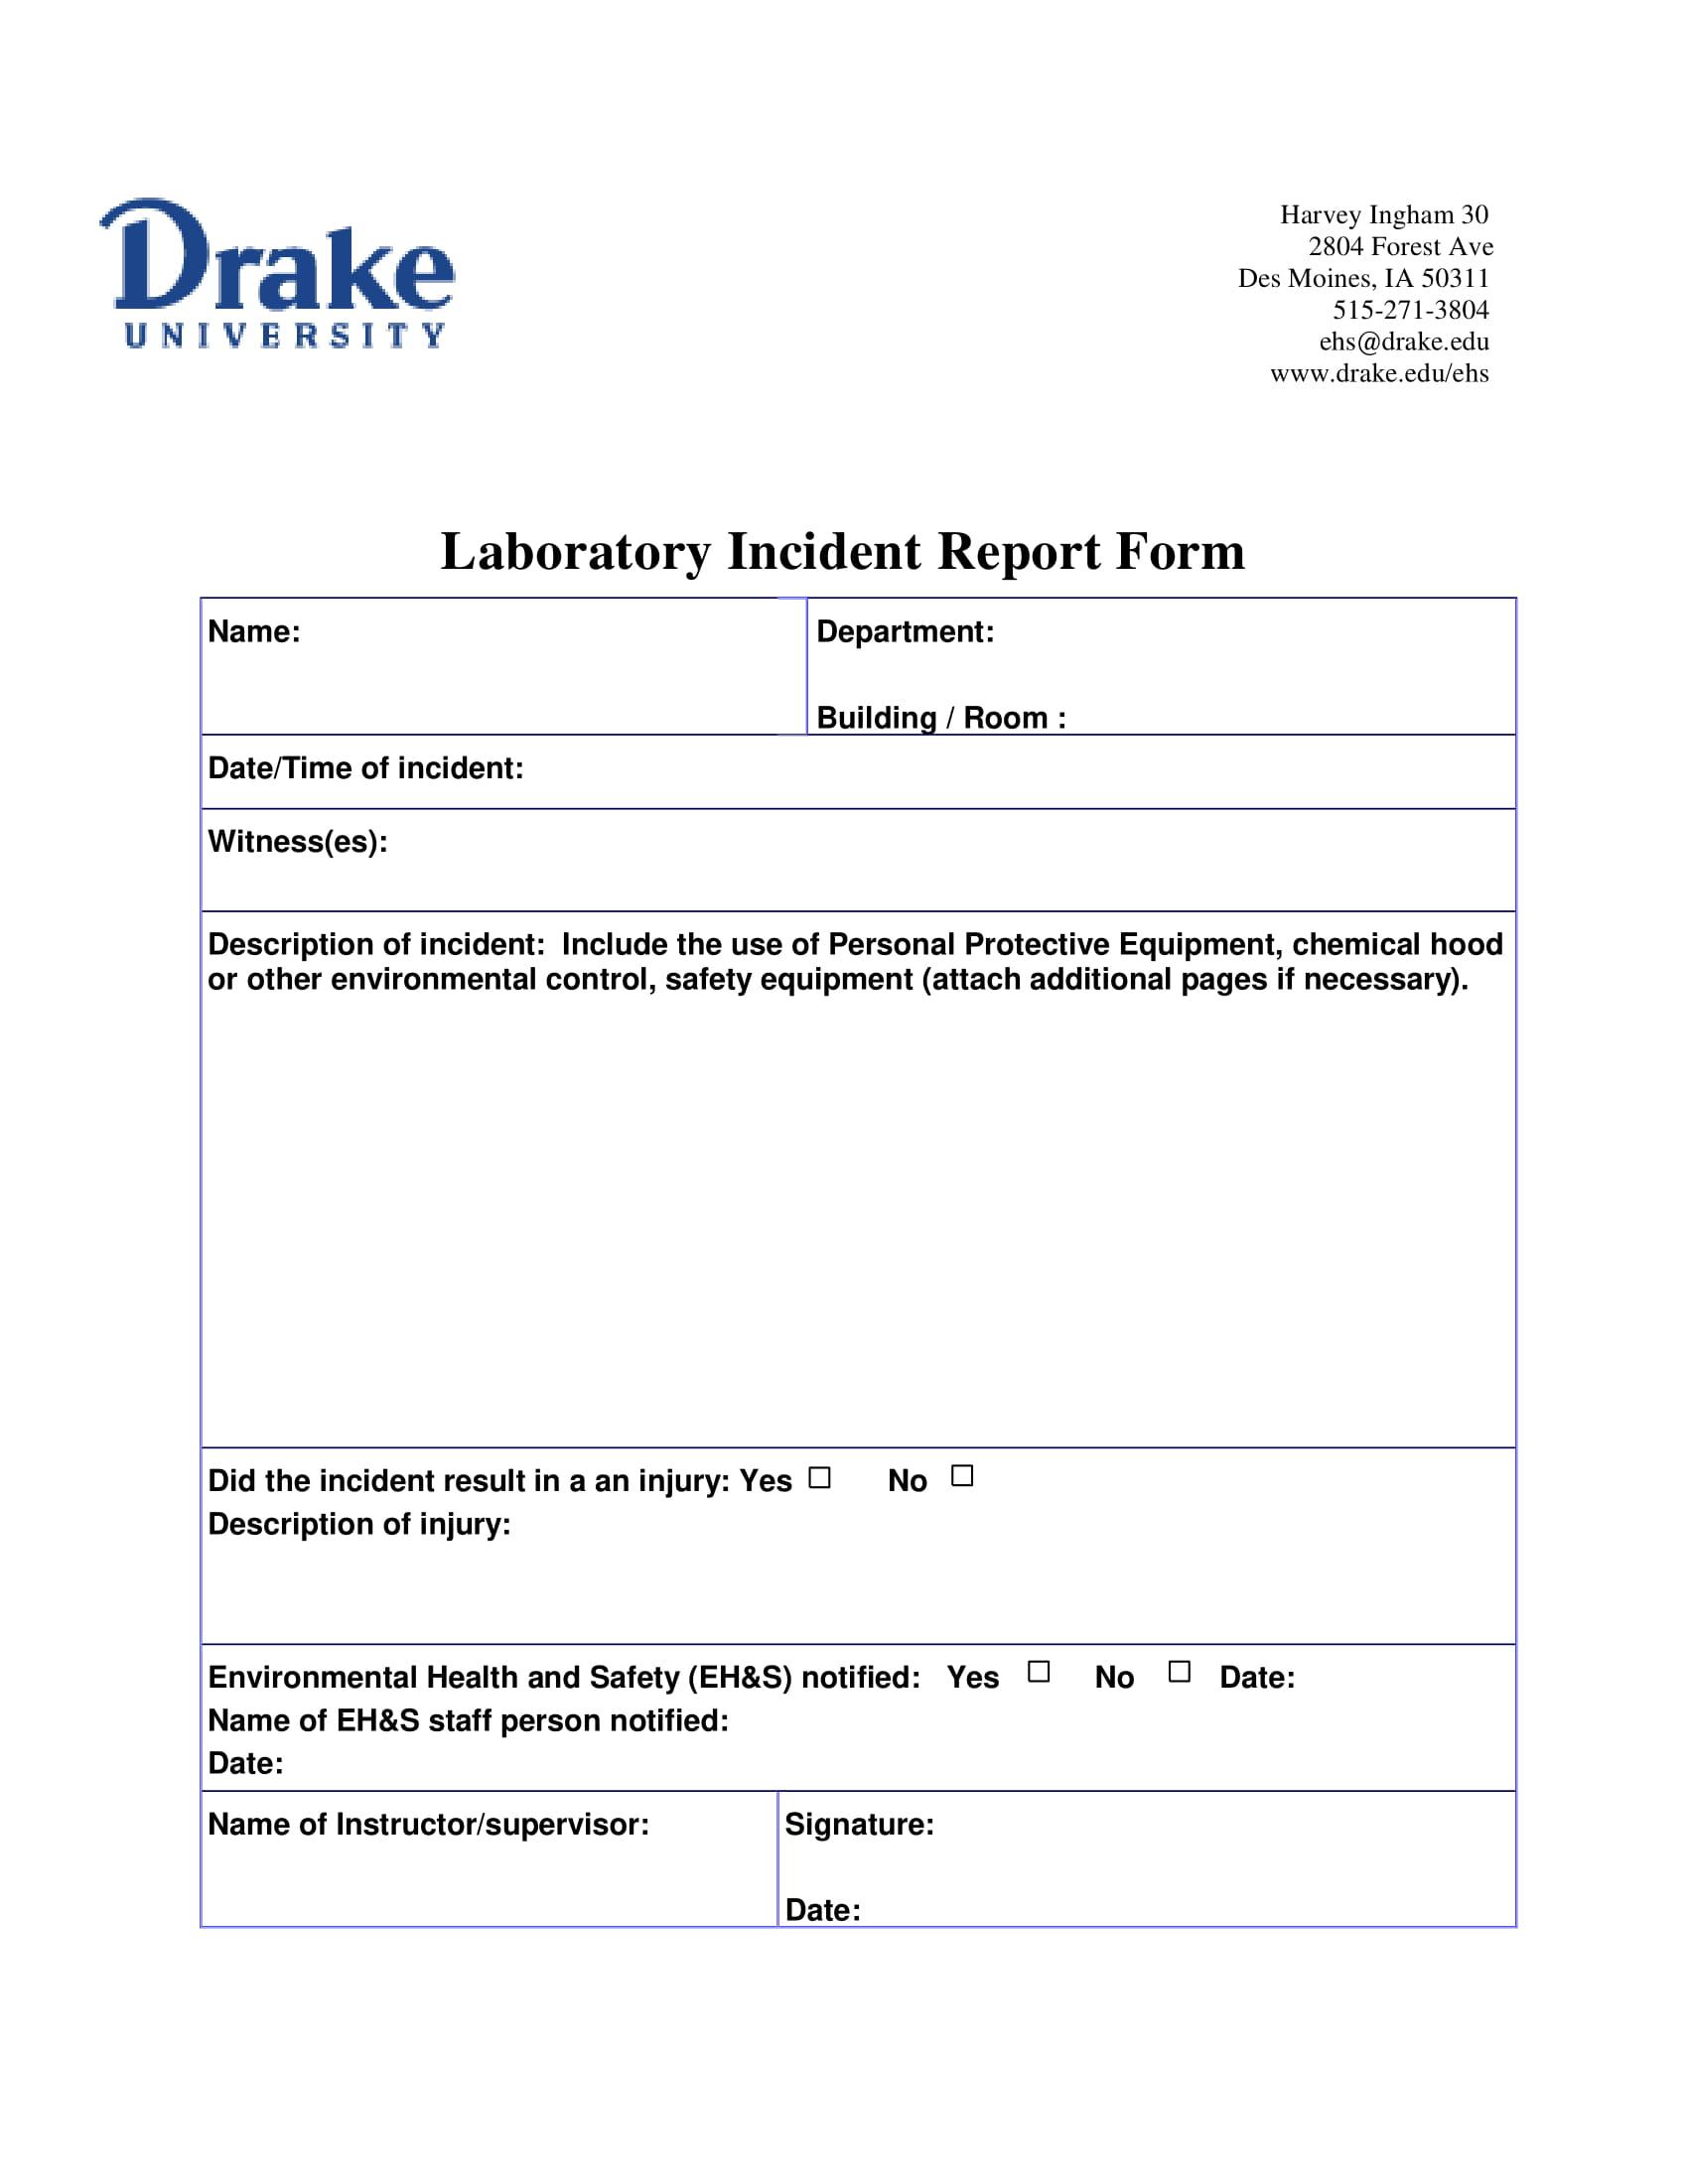 laboratory incident report form 1